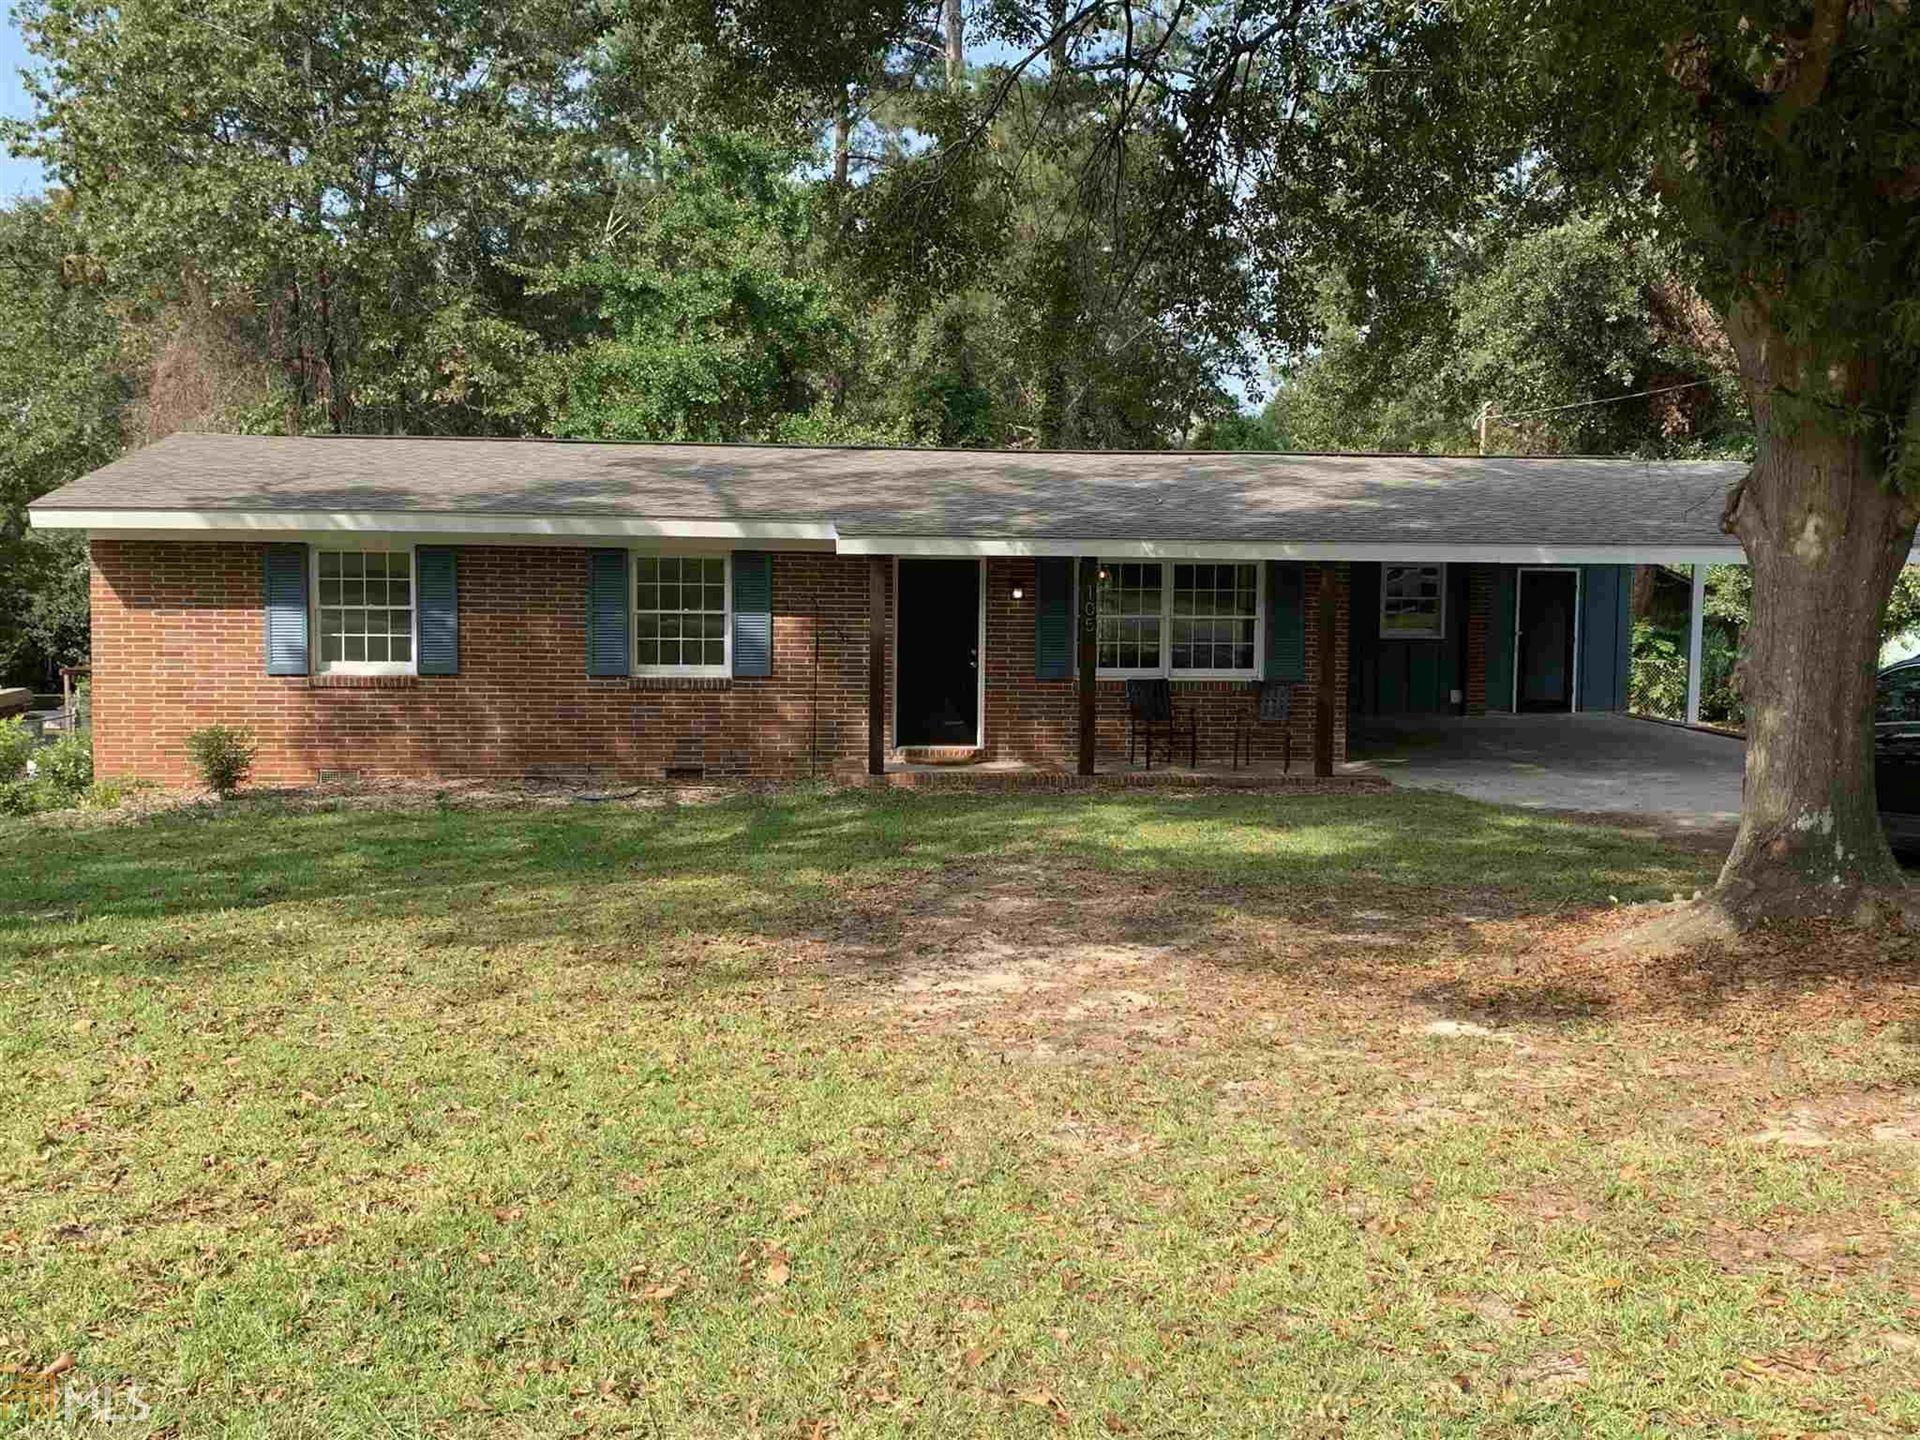 105 Forest Hill, Warner Robins, GA 31088 - MLS#: 8871693